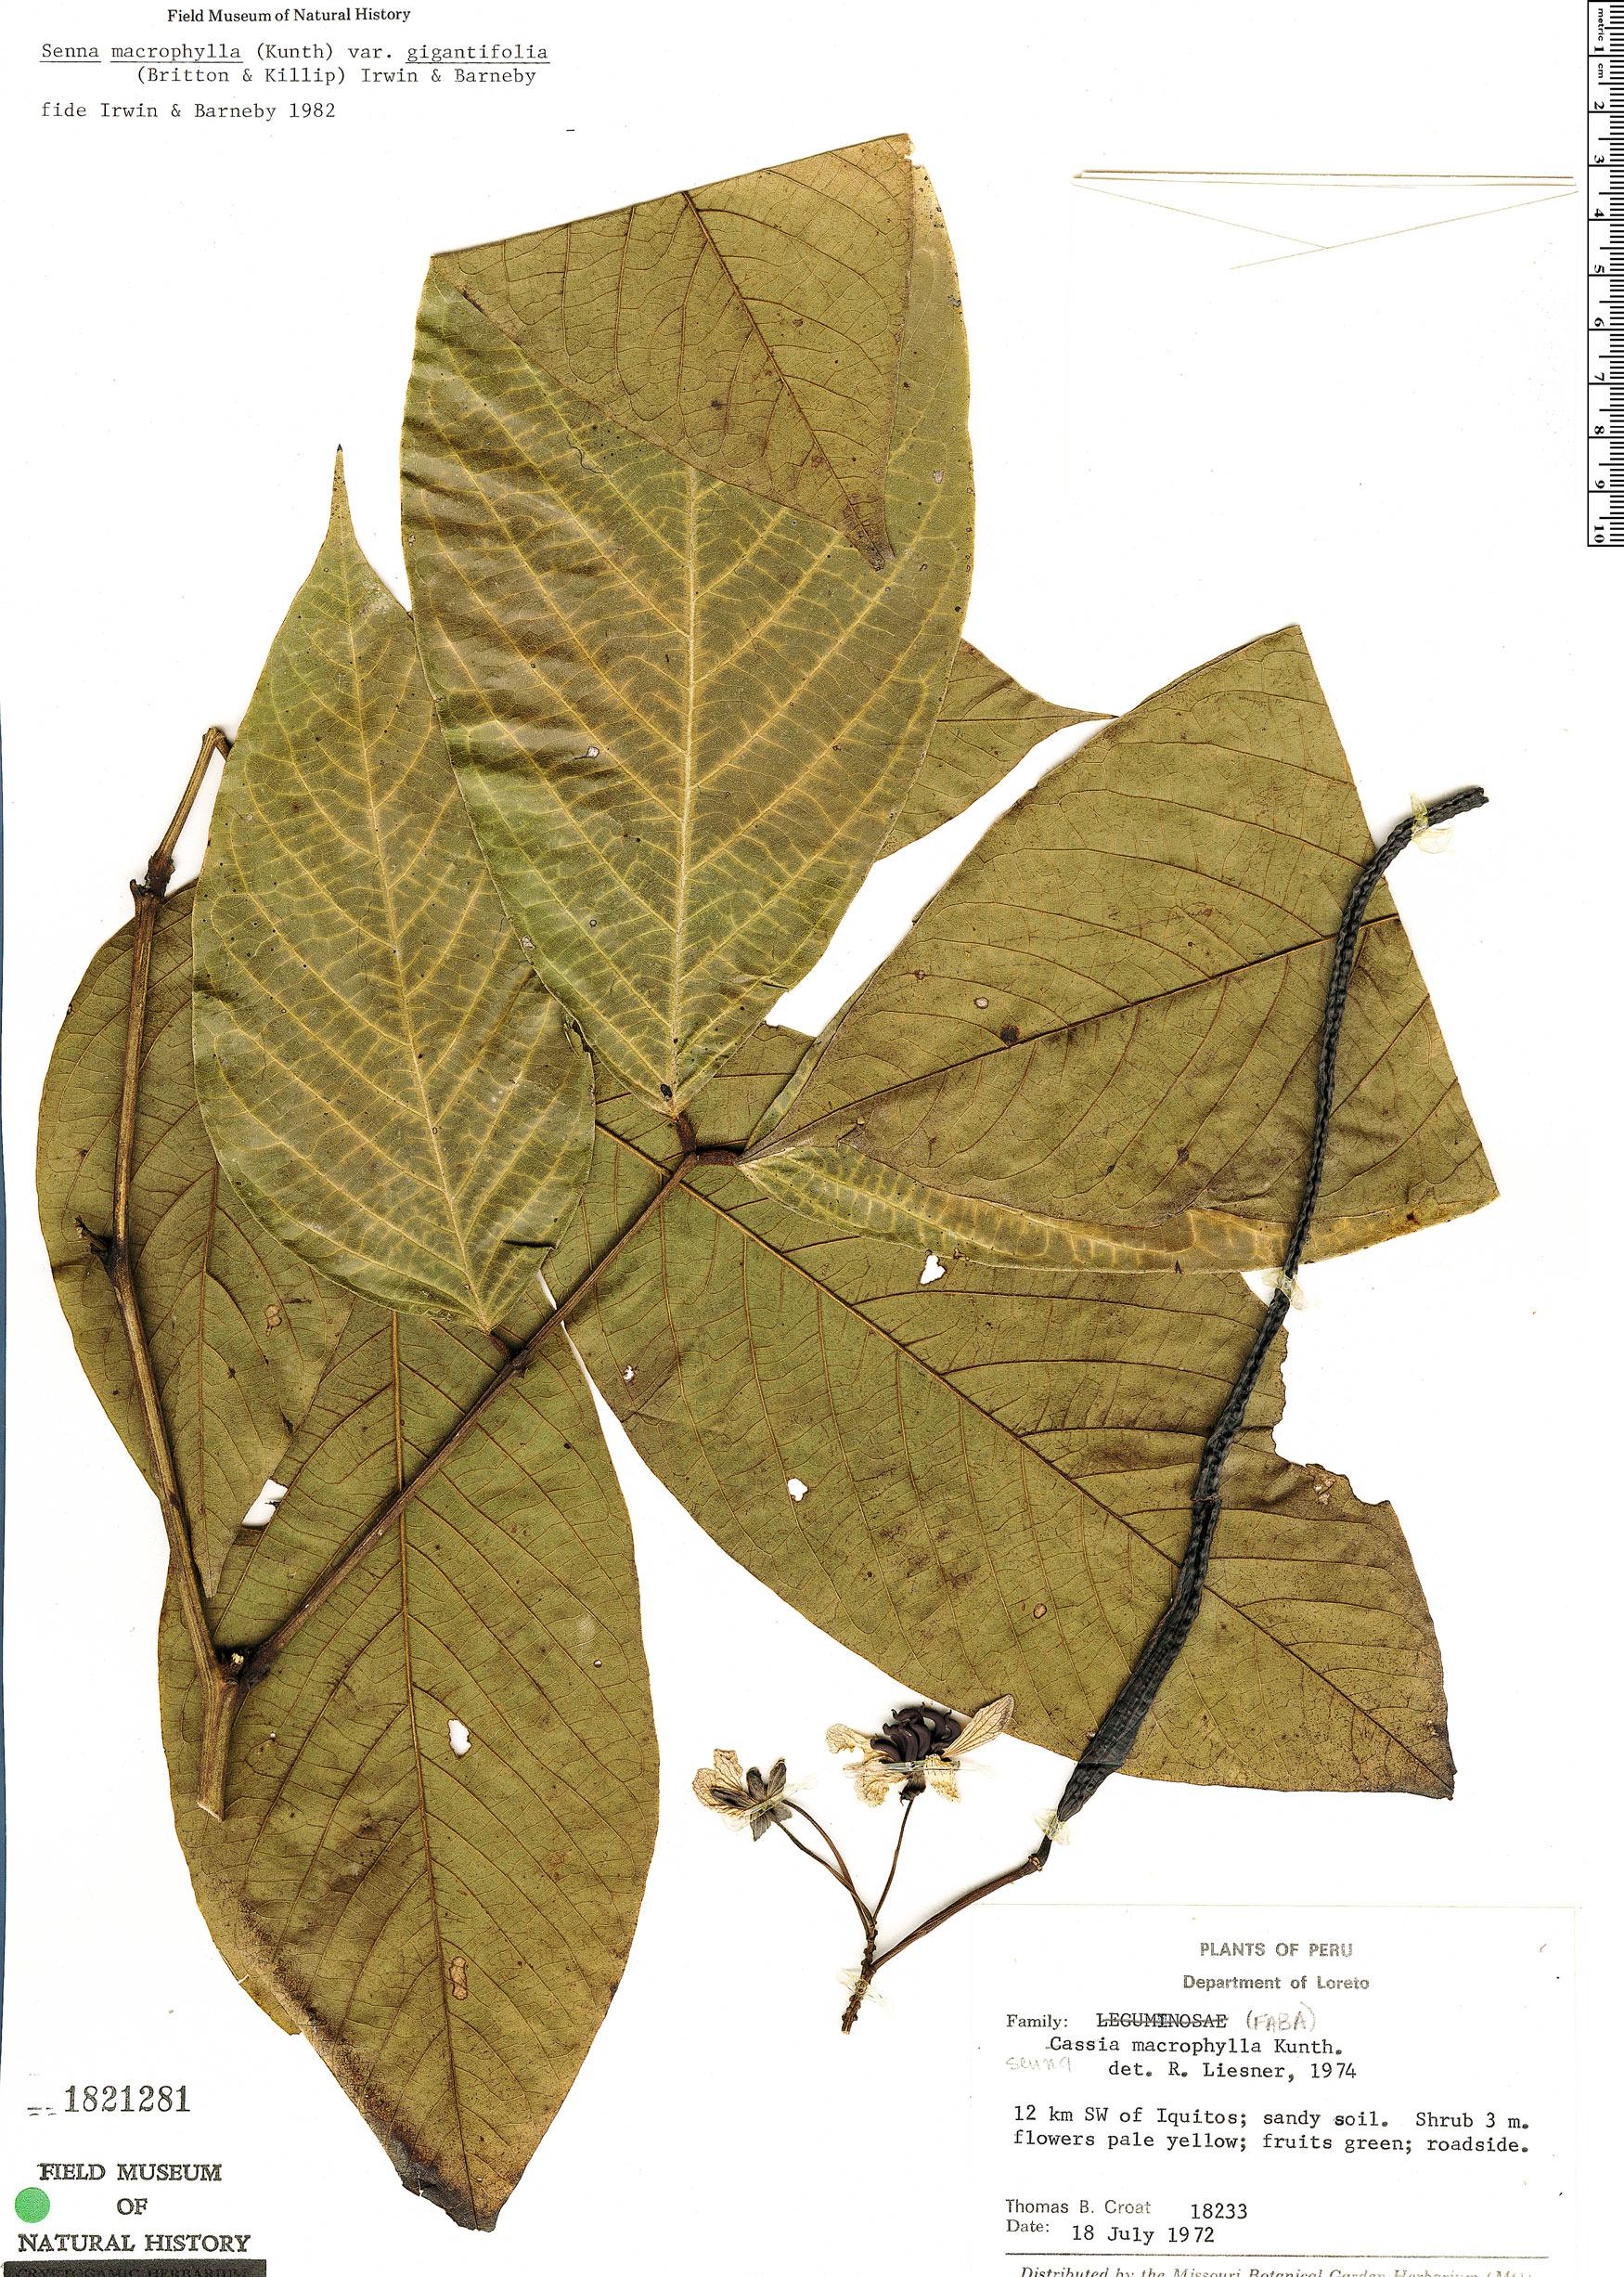 Specimen: Senna macrophylla